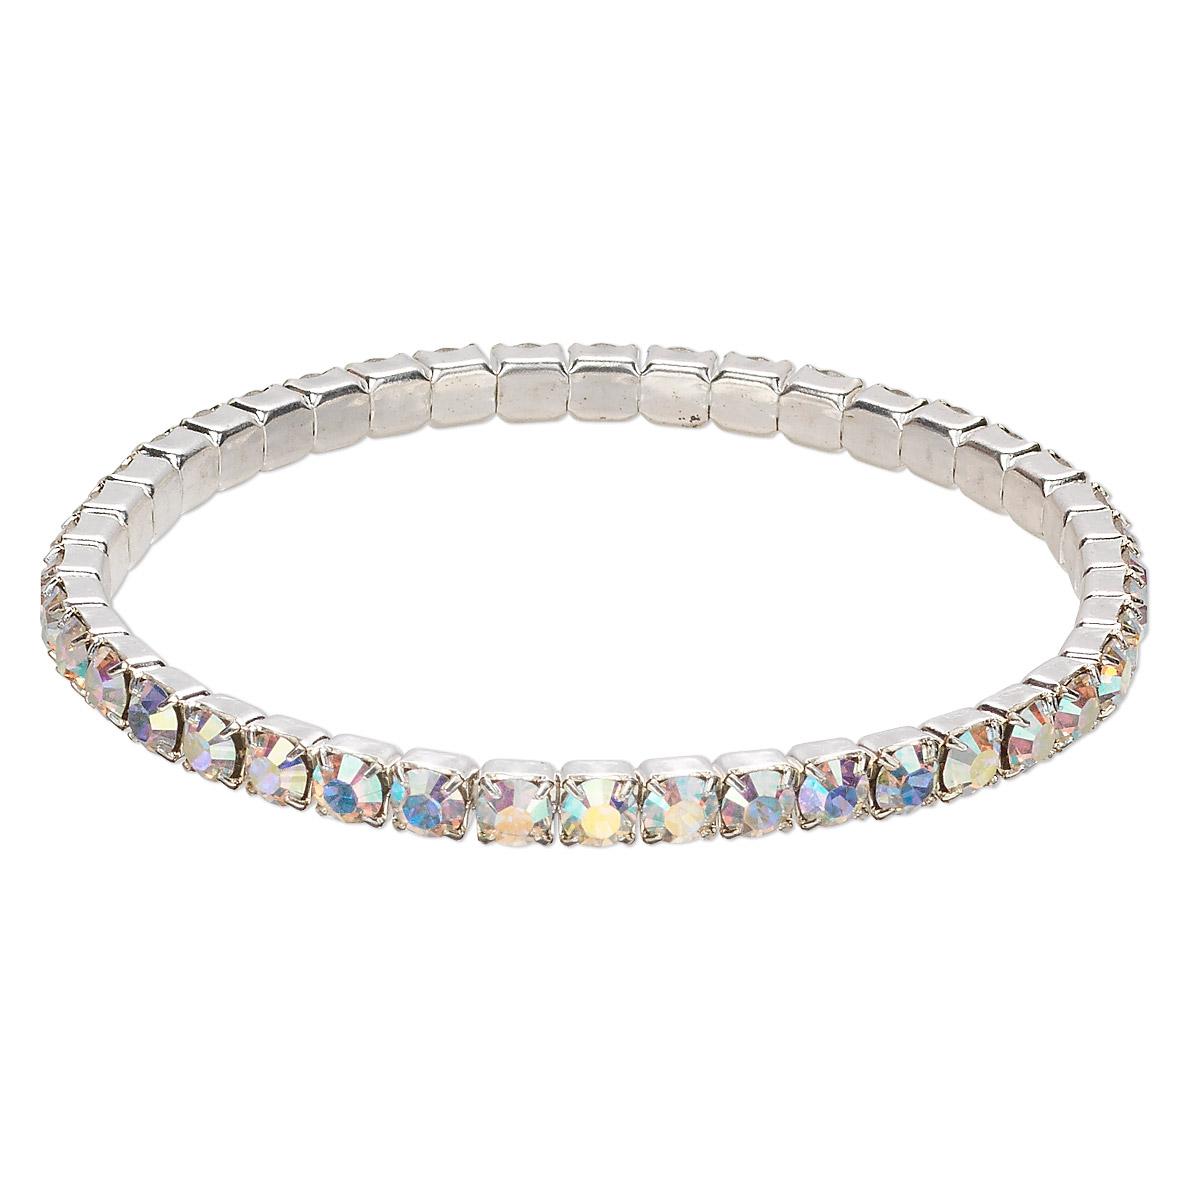 b9d923d6aef6b Bracelet, stretch, Swarovski® crystals and rhodium-plated brass ...